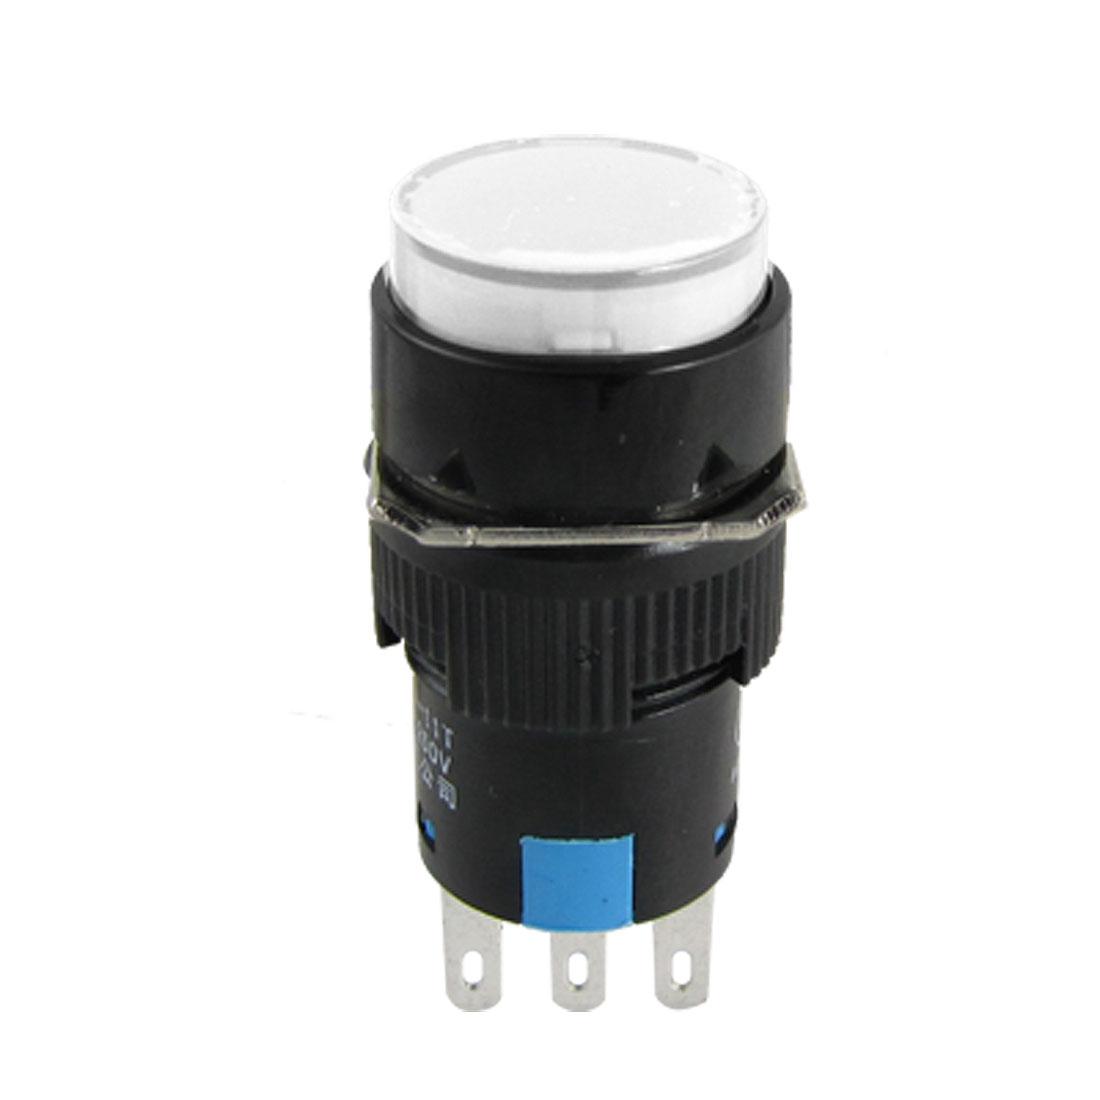 Mini AC 250V Self-locking White Cap Push Switch Black